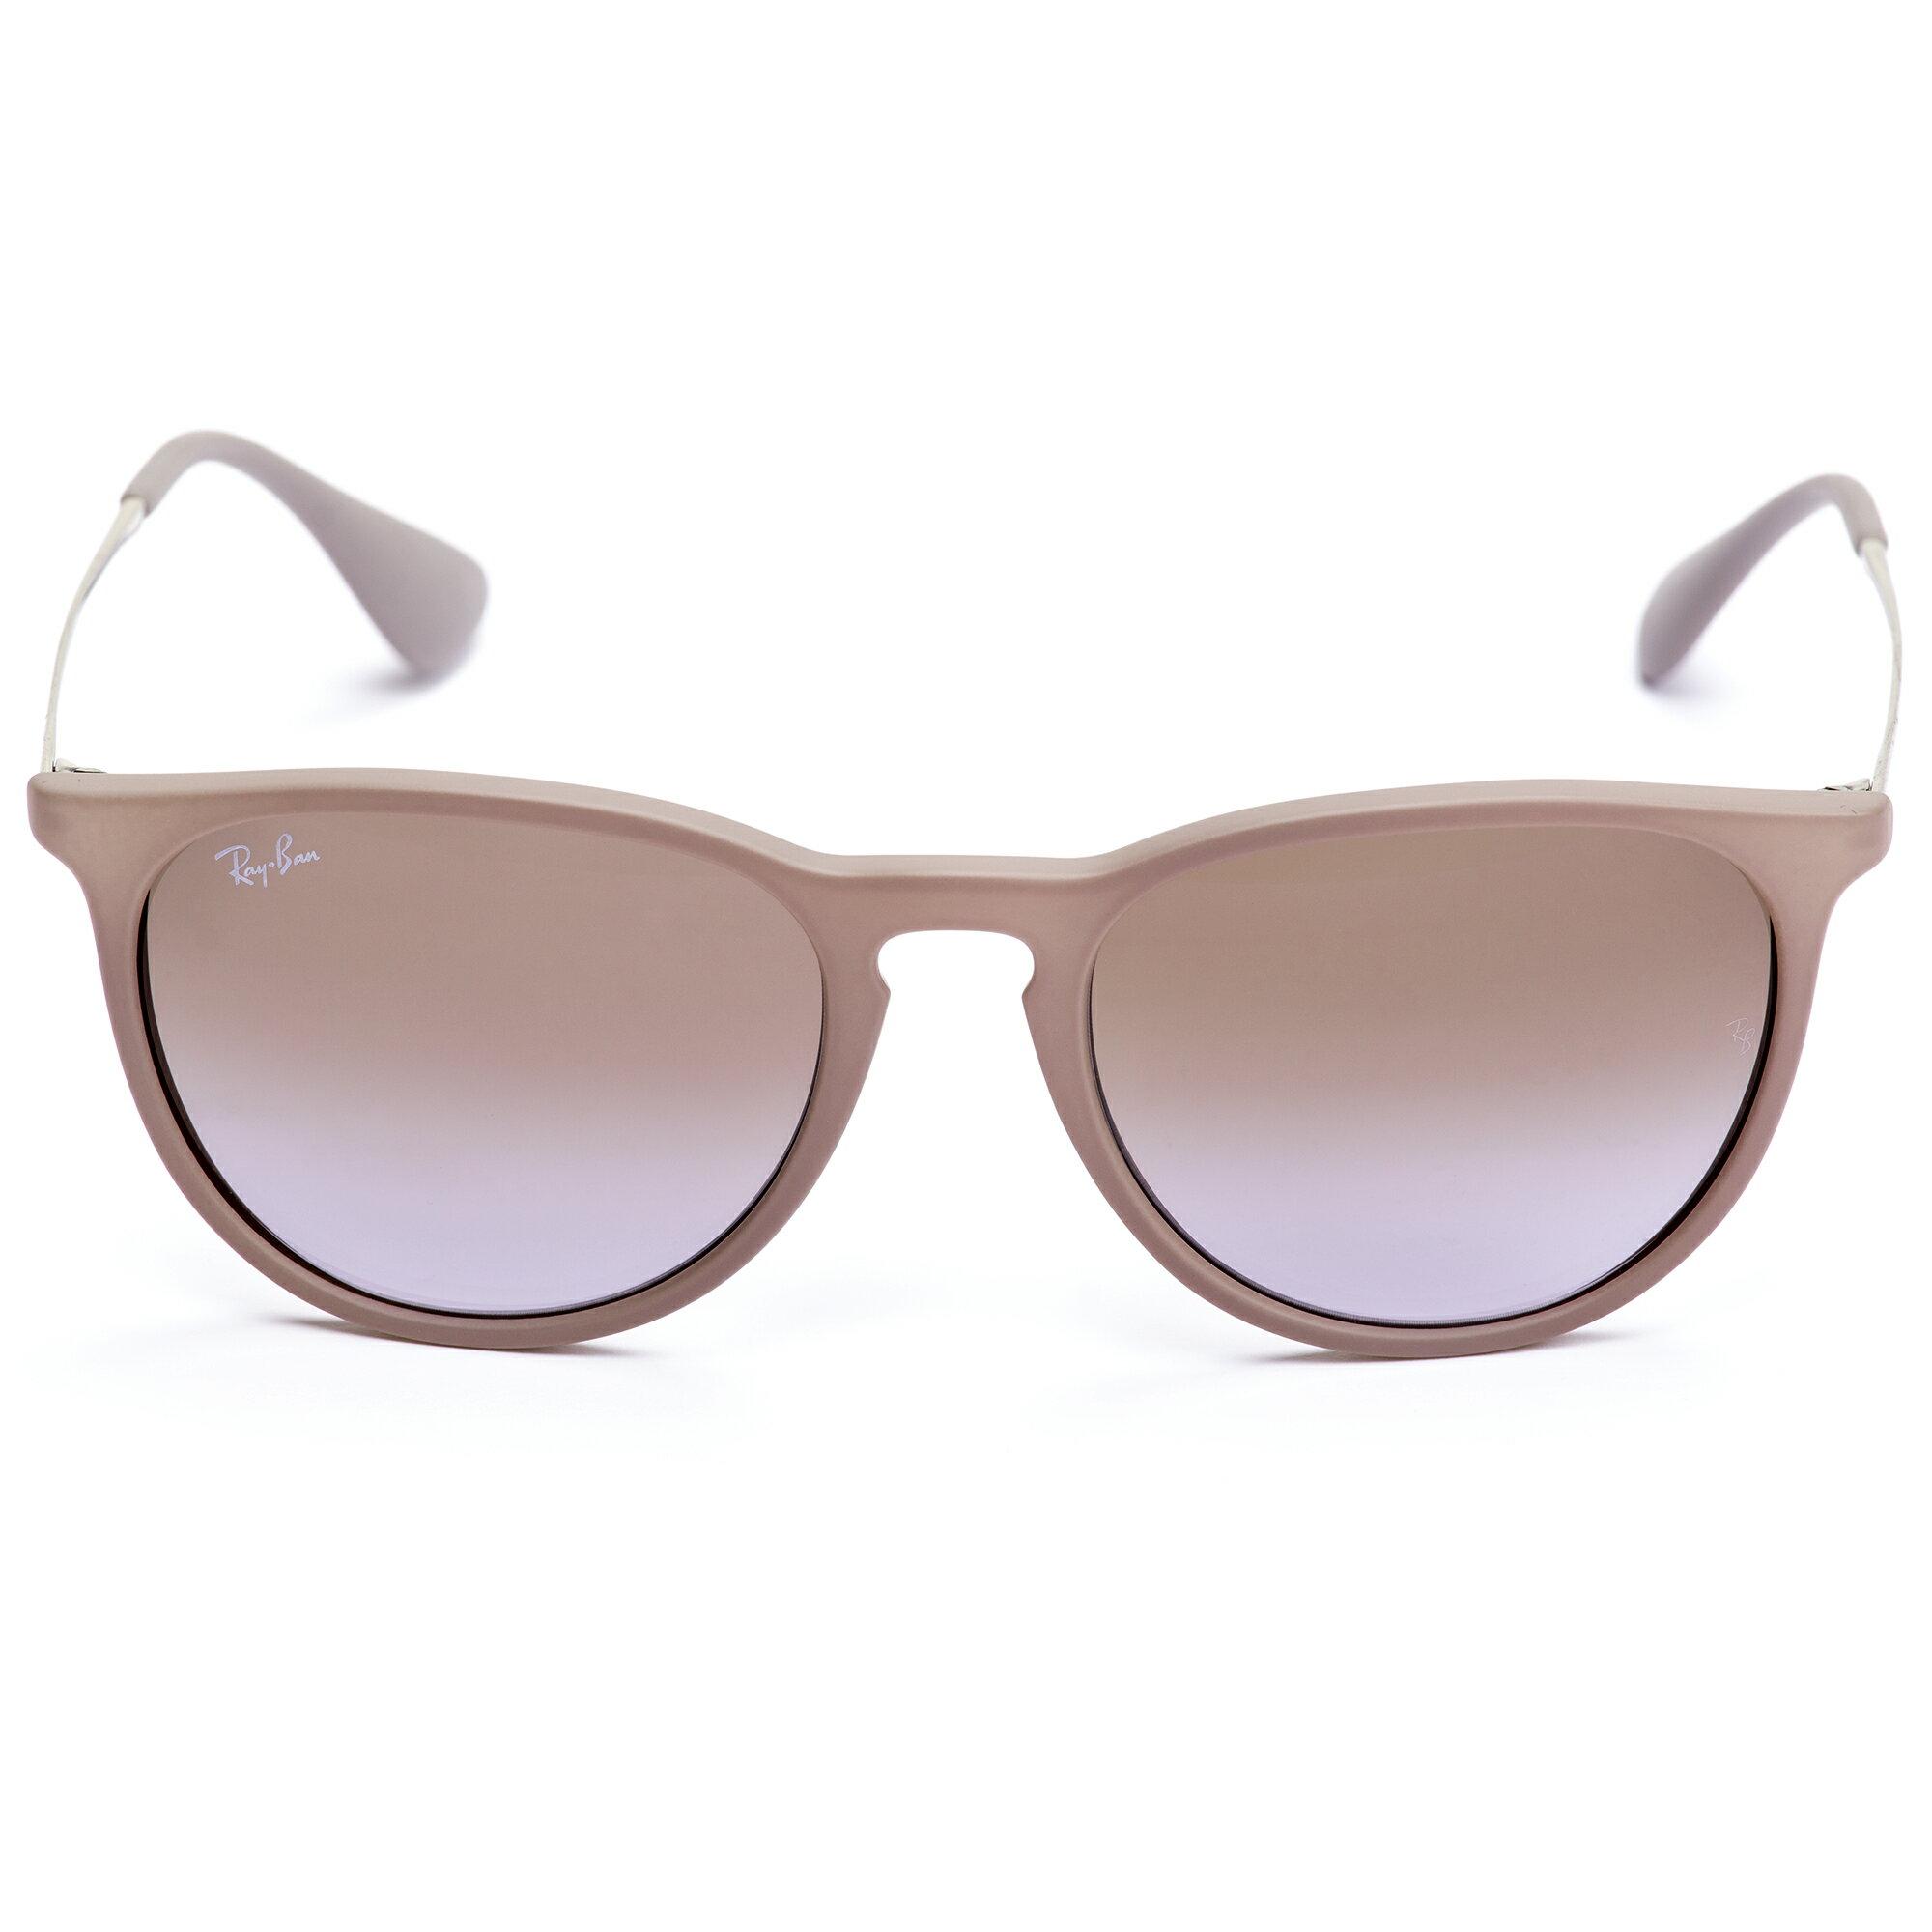 56f5a6c9d8 Ray-Ban RB4171 54mm Erika Wayarer Sunglasses (Brown Violet Gradient Lens) 1